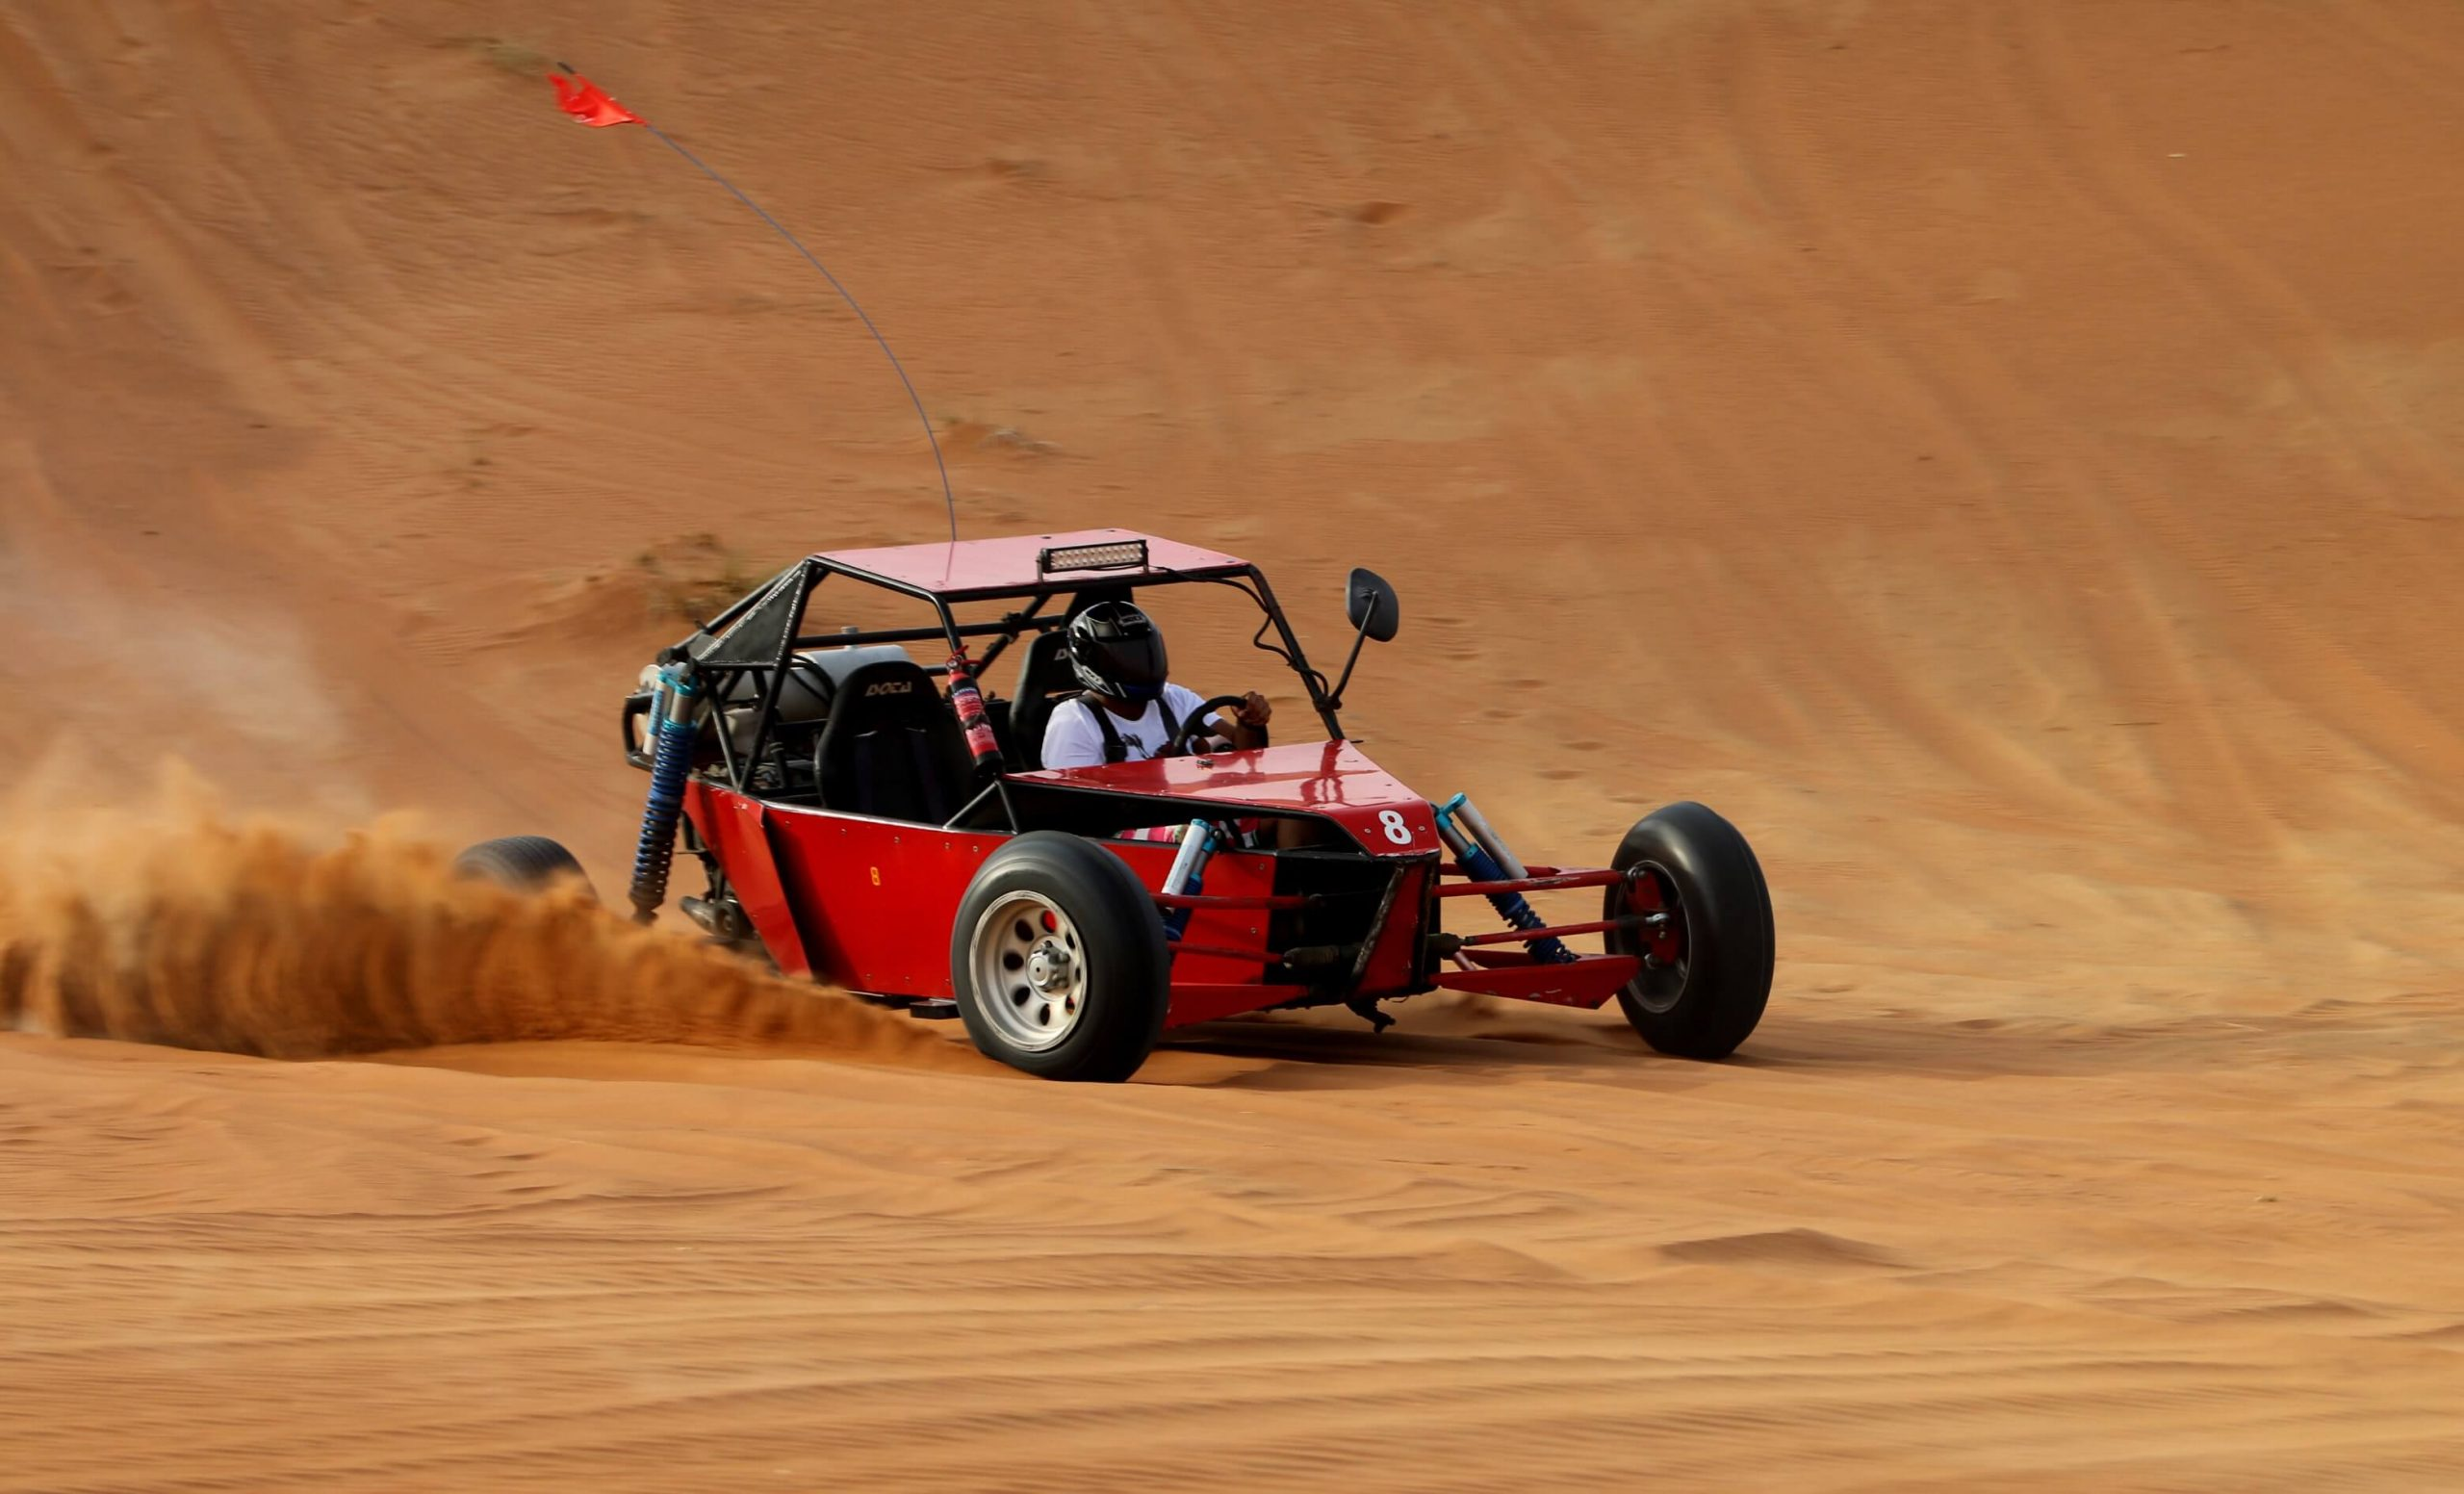 Dune Buggy Safari